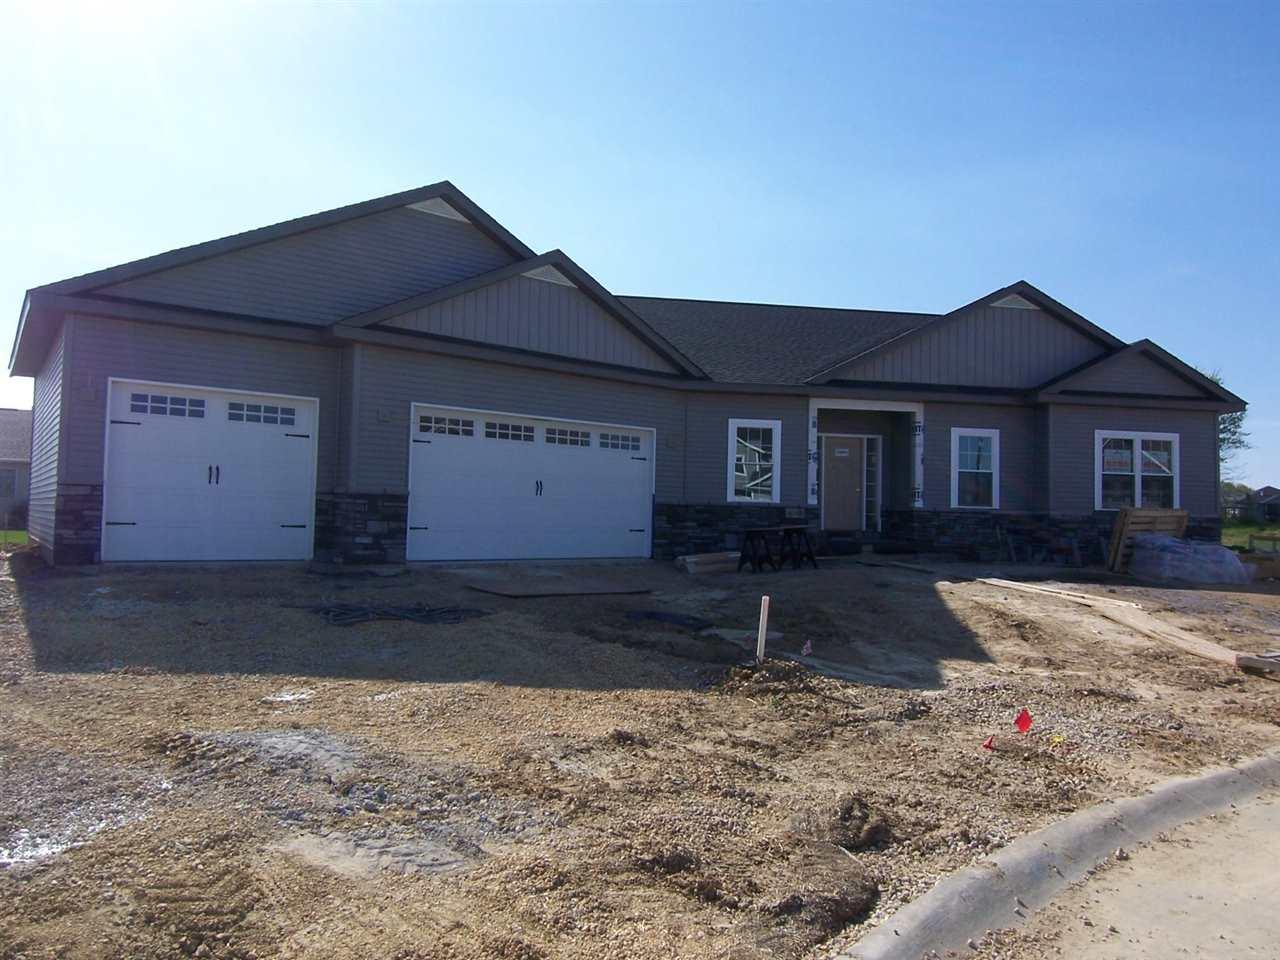 Real Estate for Sale, ListingId: 32845177, Davenport,IA52807